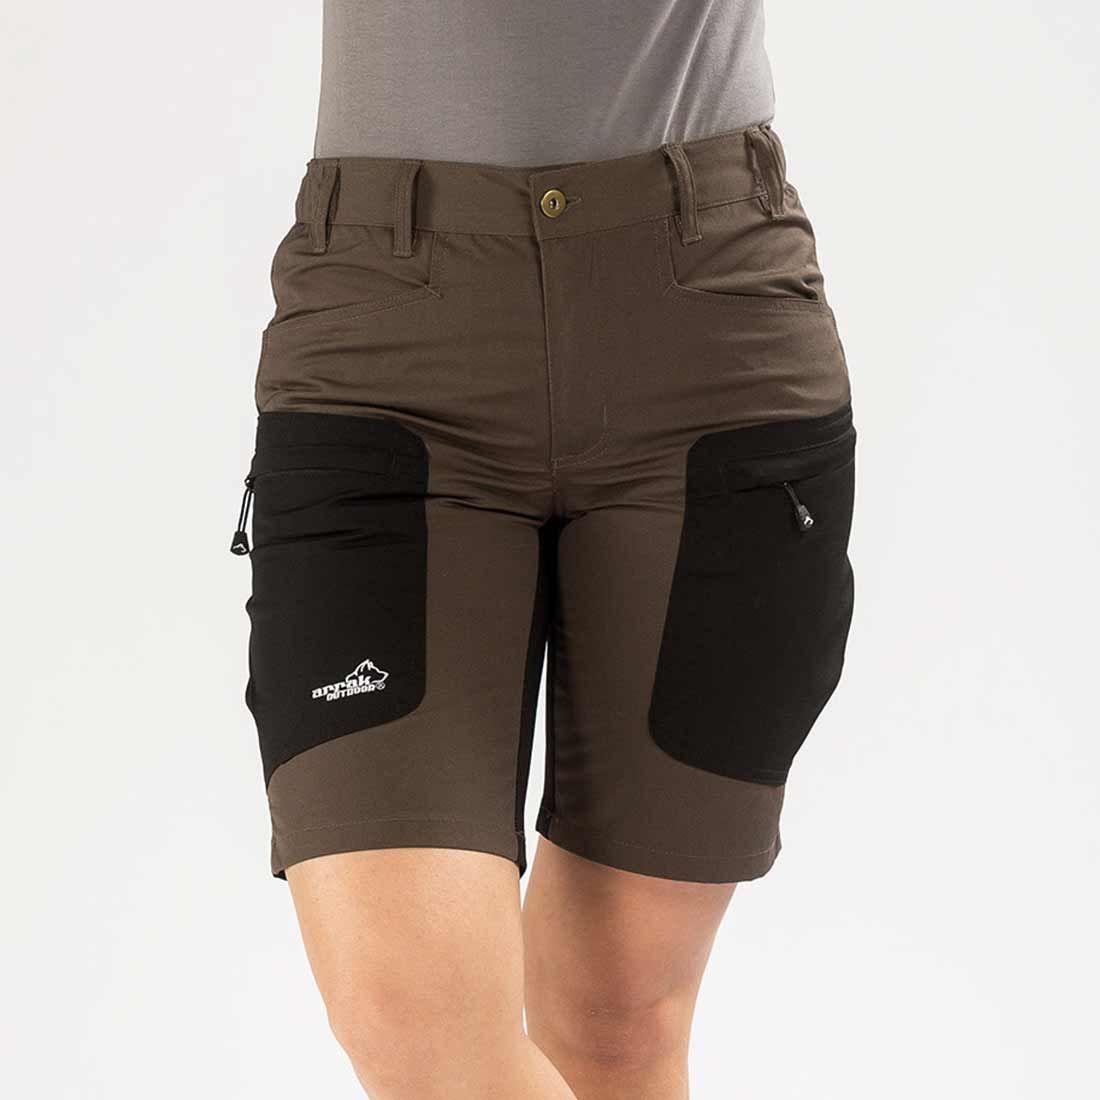 Arrak Active stretch Shorts LADY Brown 48